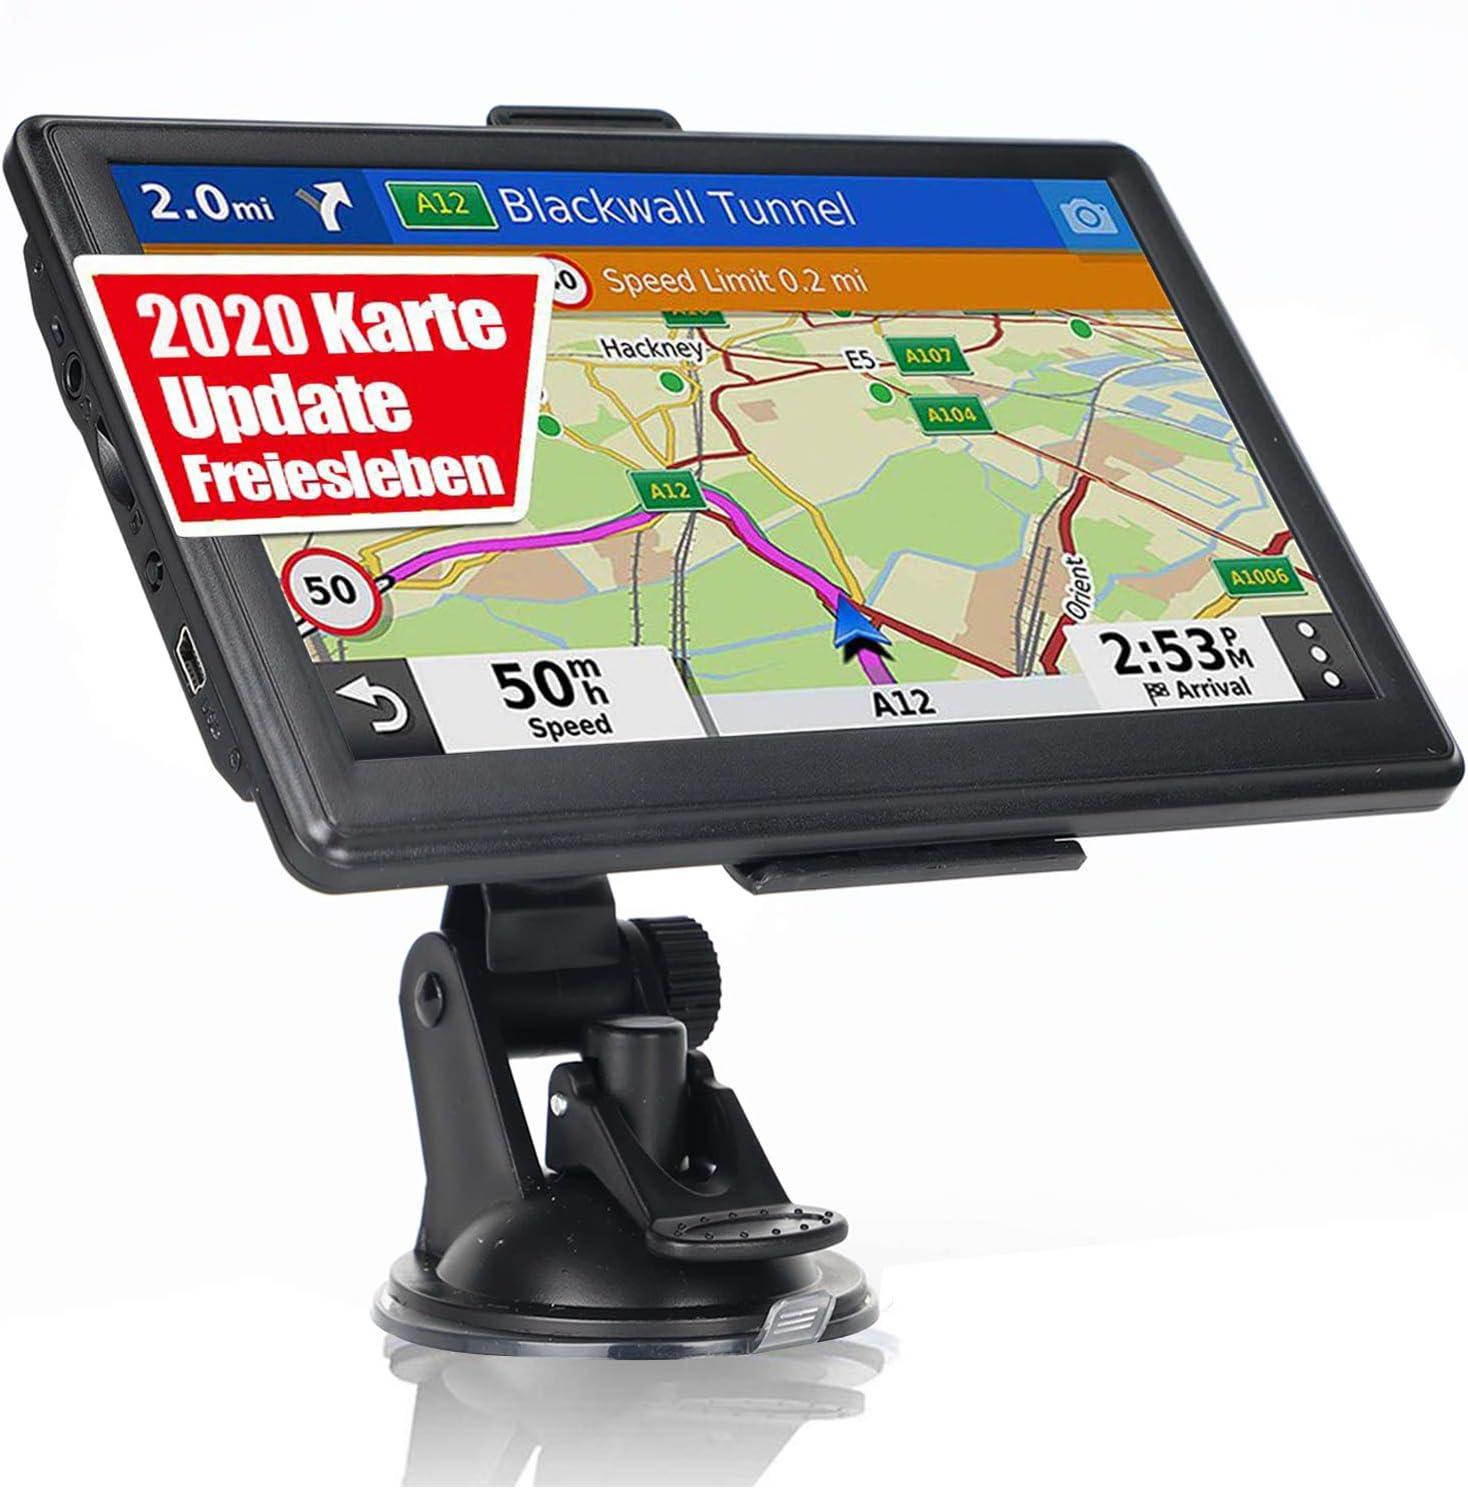 bicicleta autob/ús 46 Europa pa/íses de Europa con Russia y turquesa soporte de tarjeta coche Gratis de Pop de actualizaci/ón camper o en modo peatonal... 10,92 cm GPS navegador GPS incluye parasol para cami/ón Disponible e